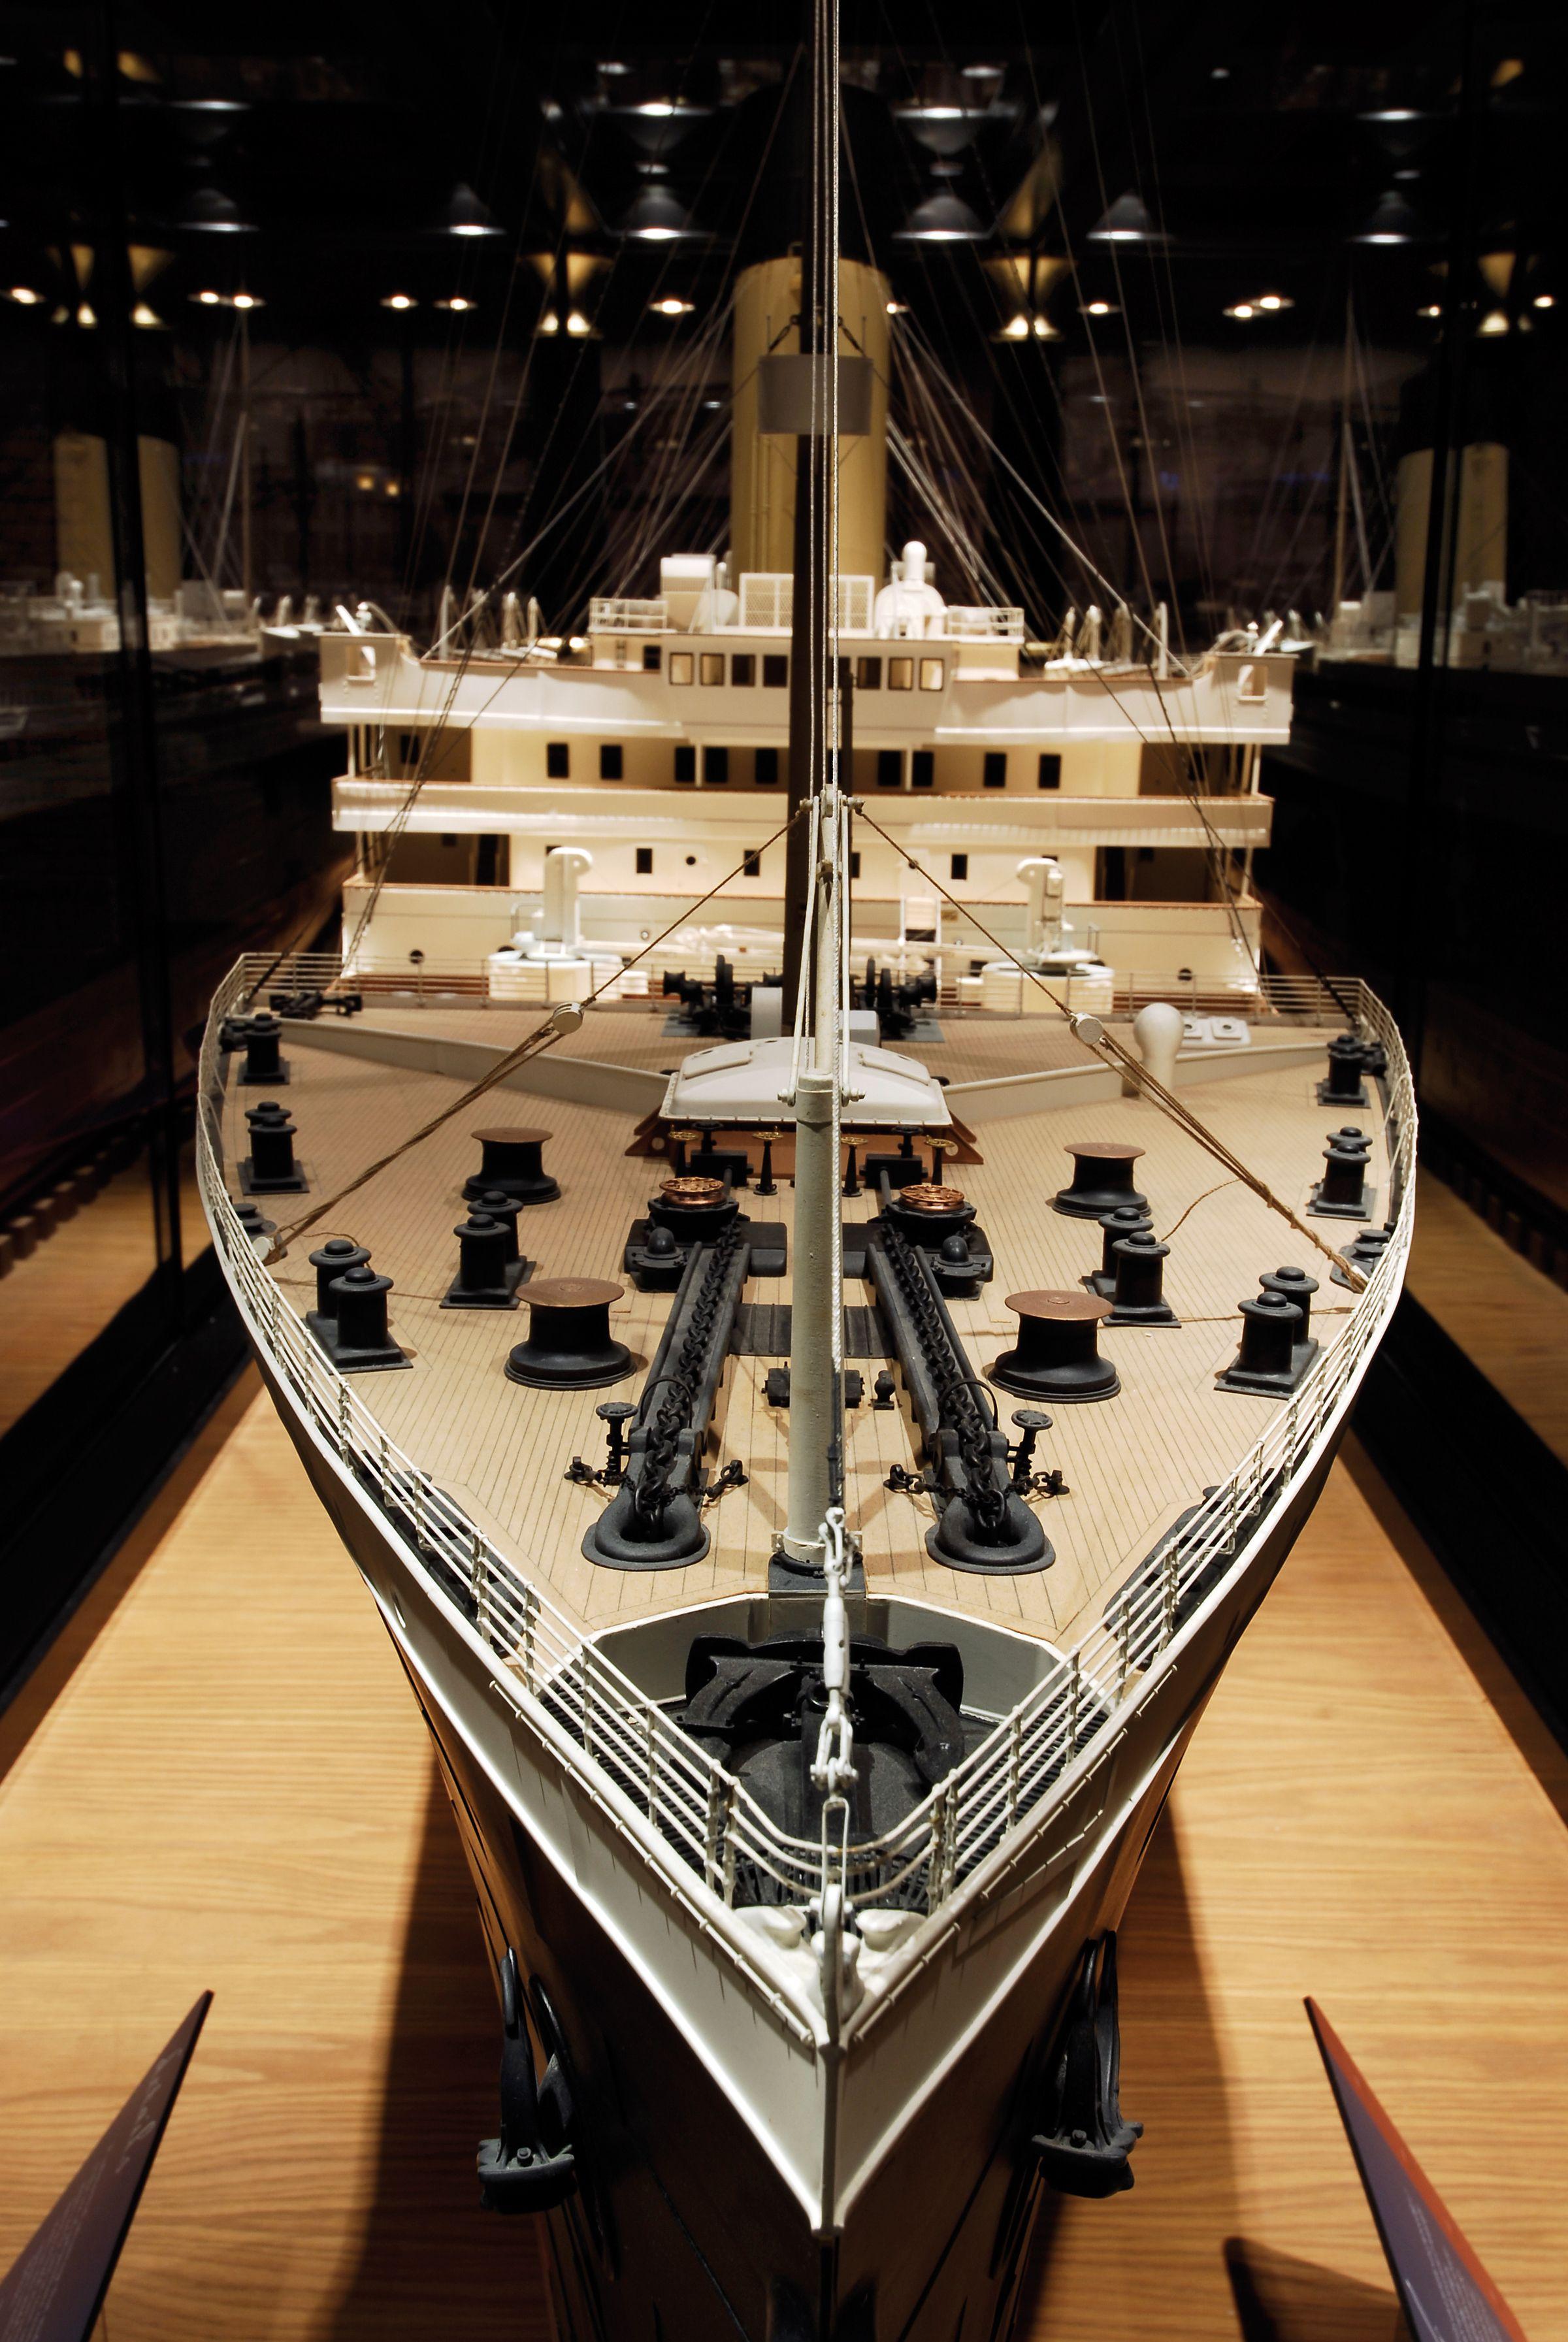 titanic replica in branson mo business failures we